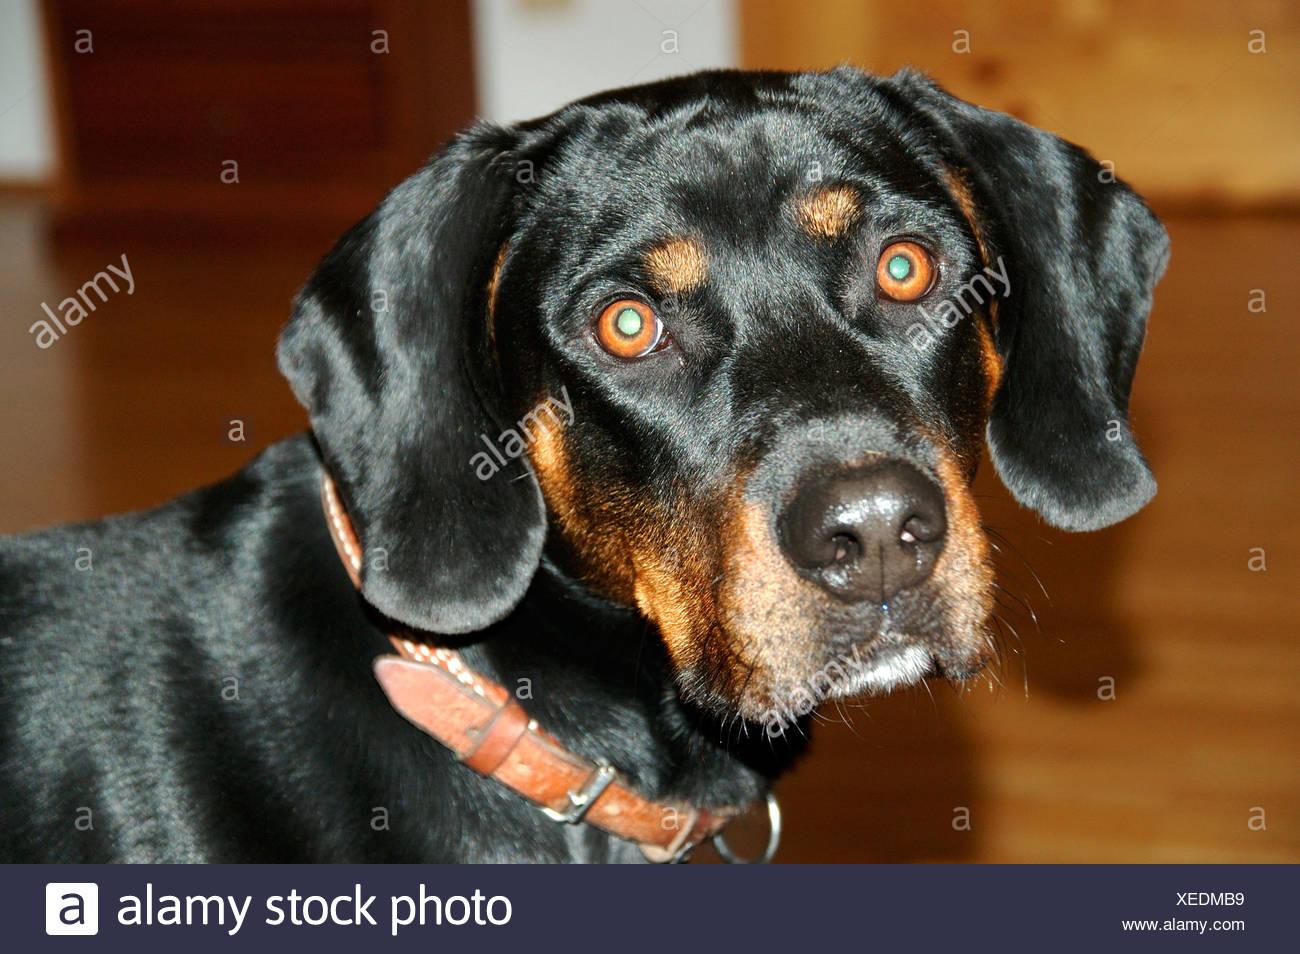 Head of a pedigreed dog Brandlbracke - Stock Image